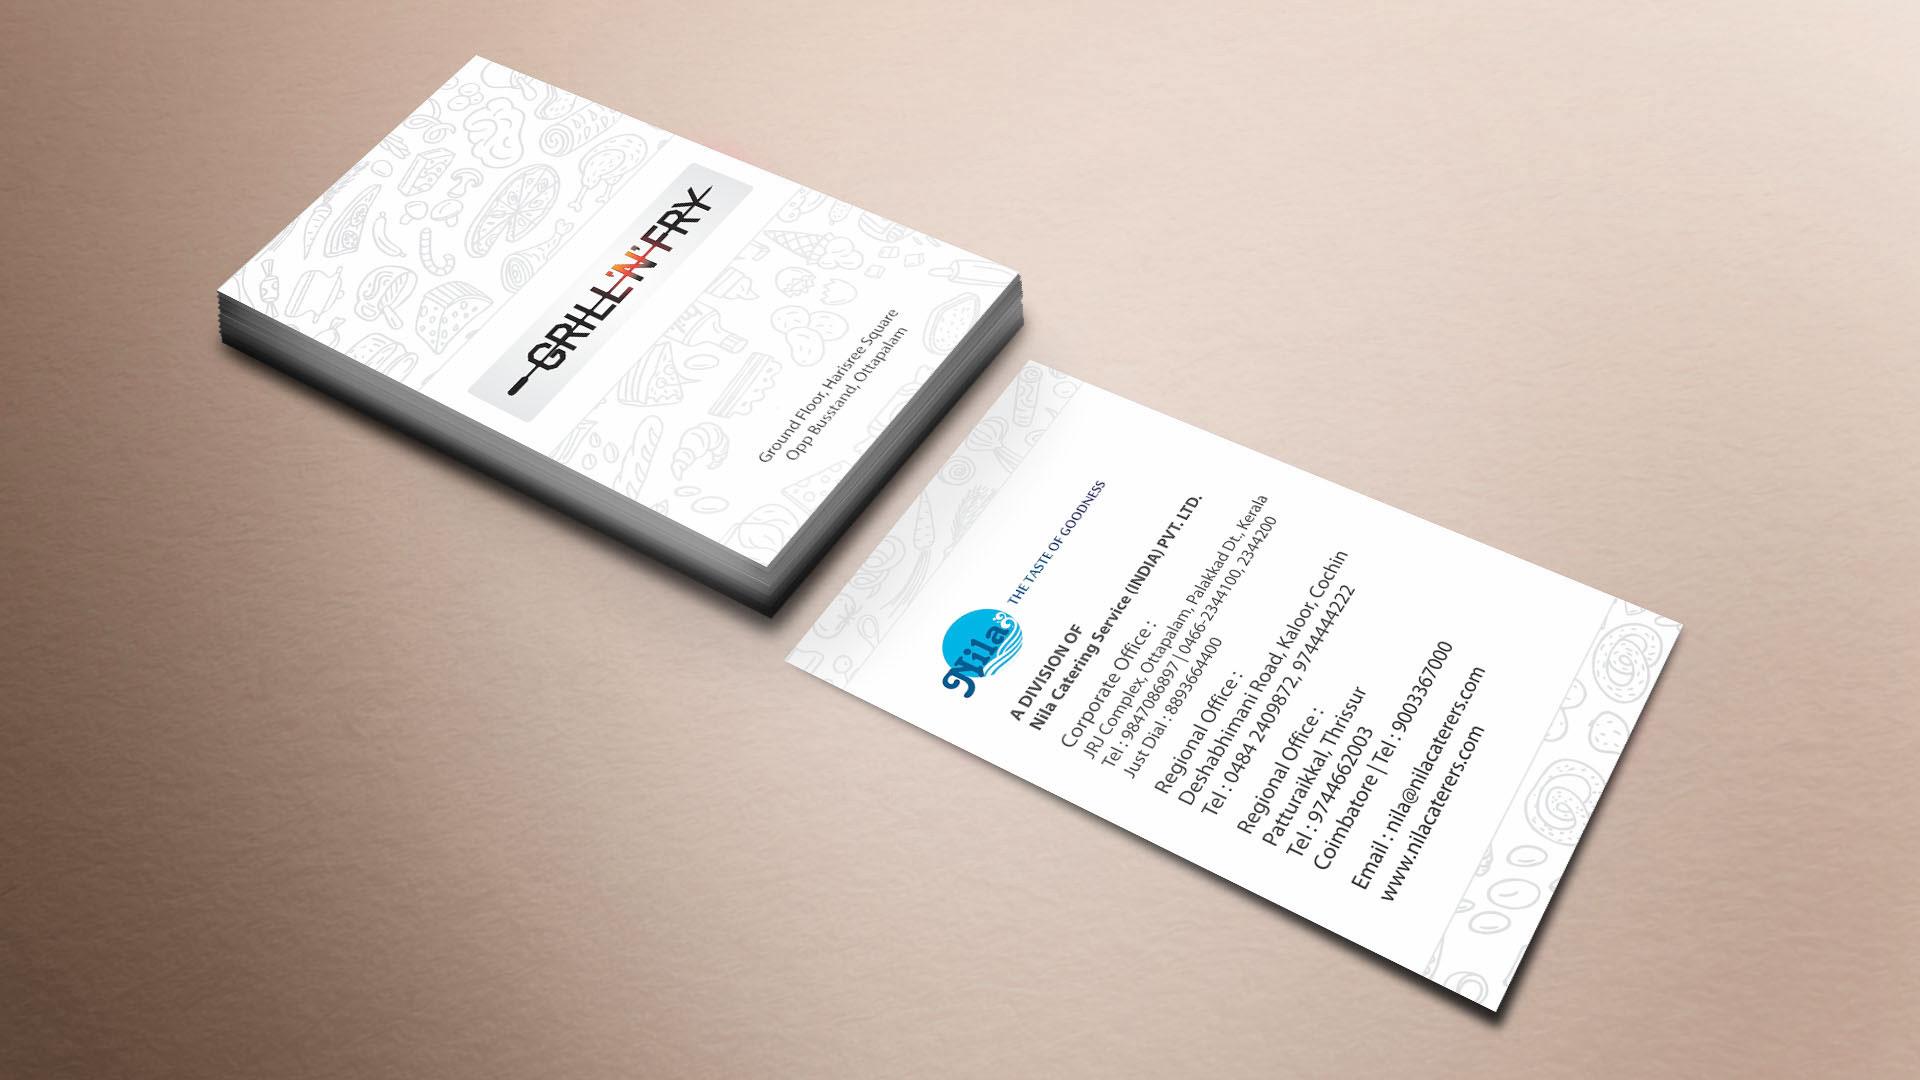 Nila Grill 'N' Fry Business Card design